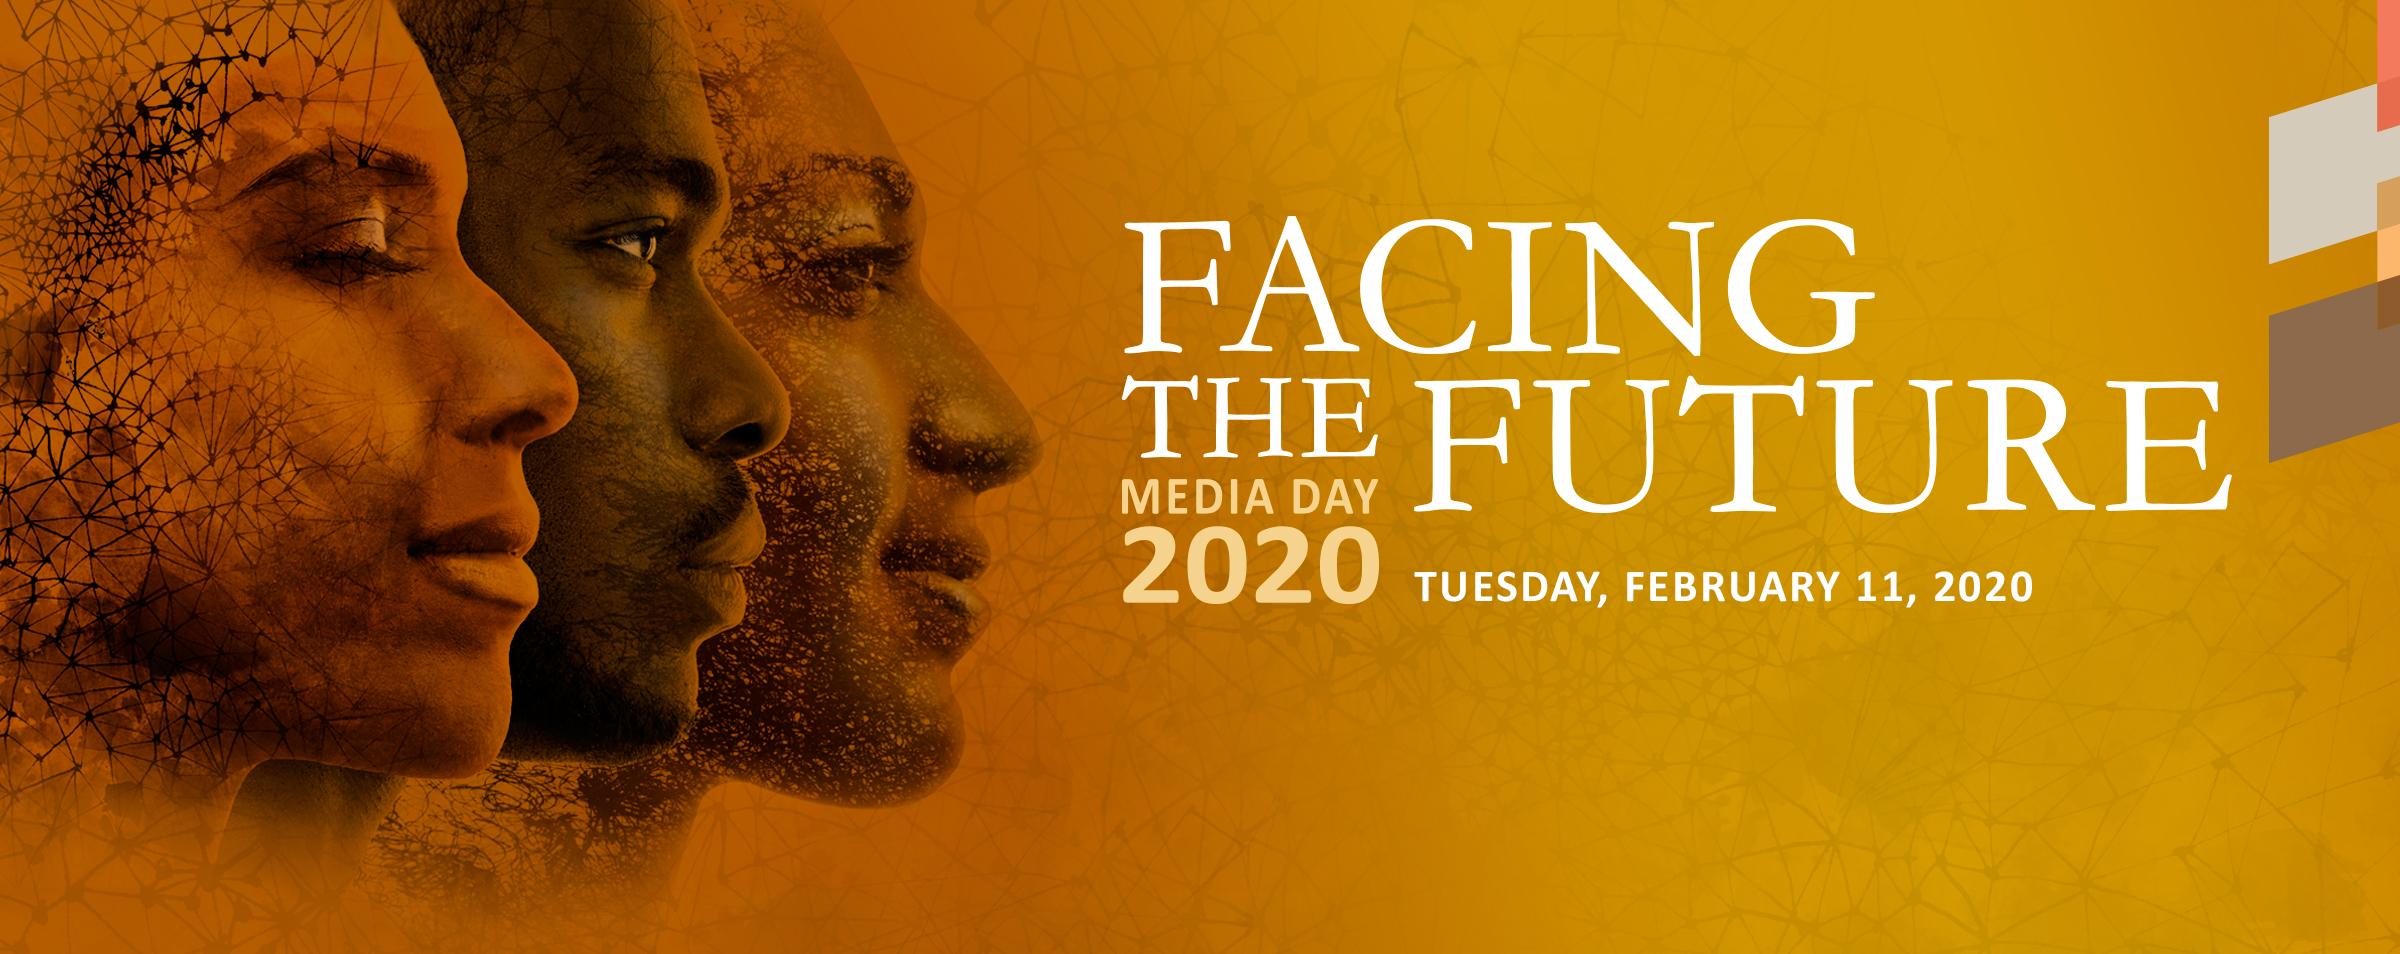 2020 SOCS Media Day-banner-image